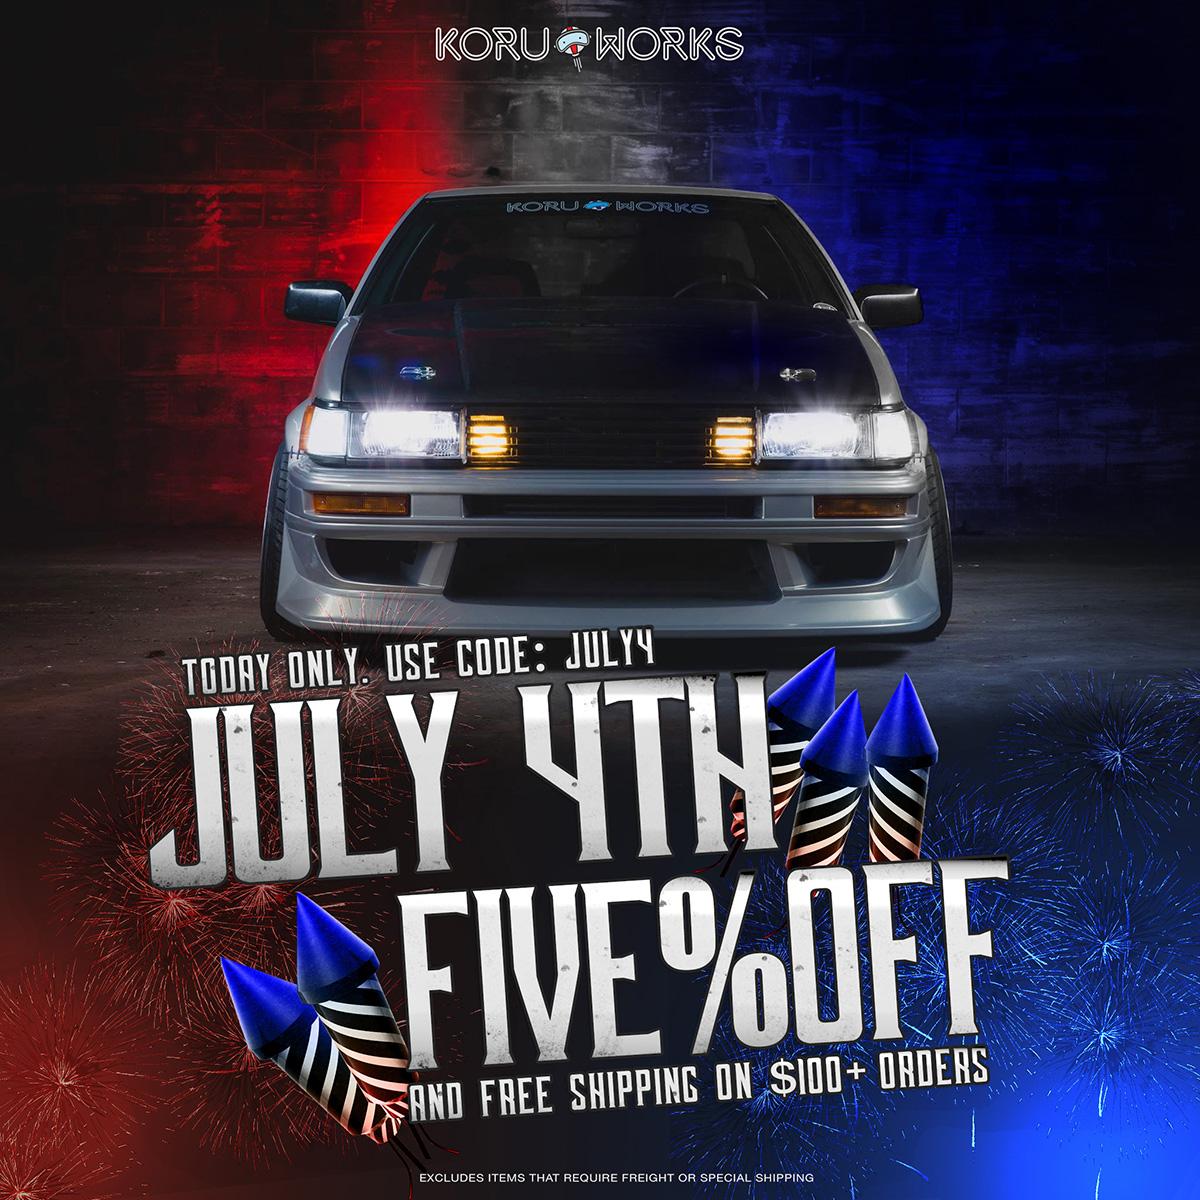 KoruWorks July 4th Sale